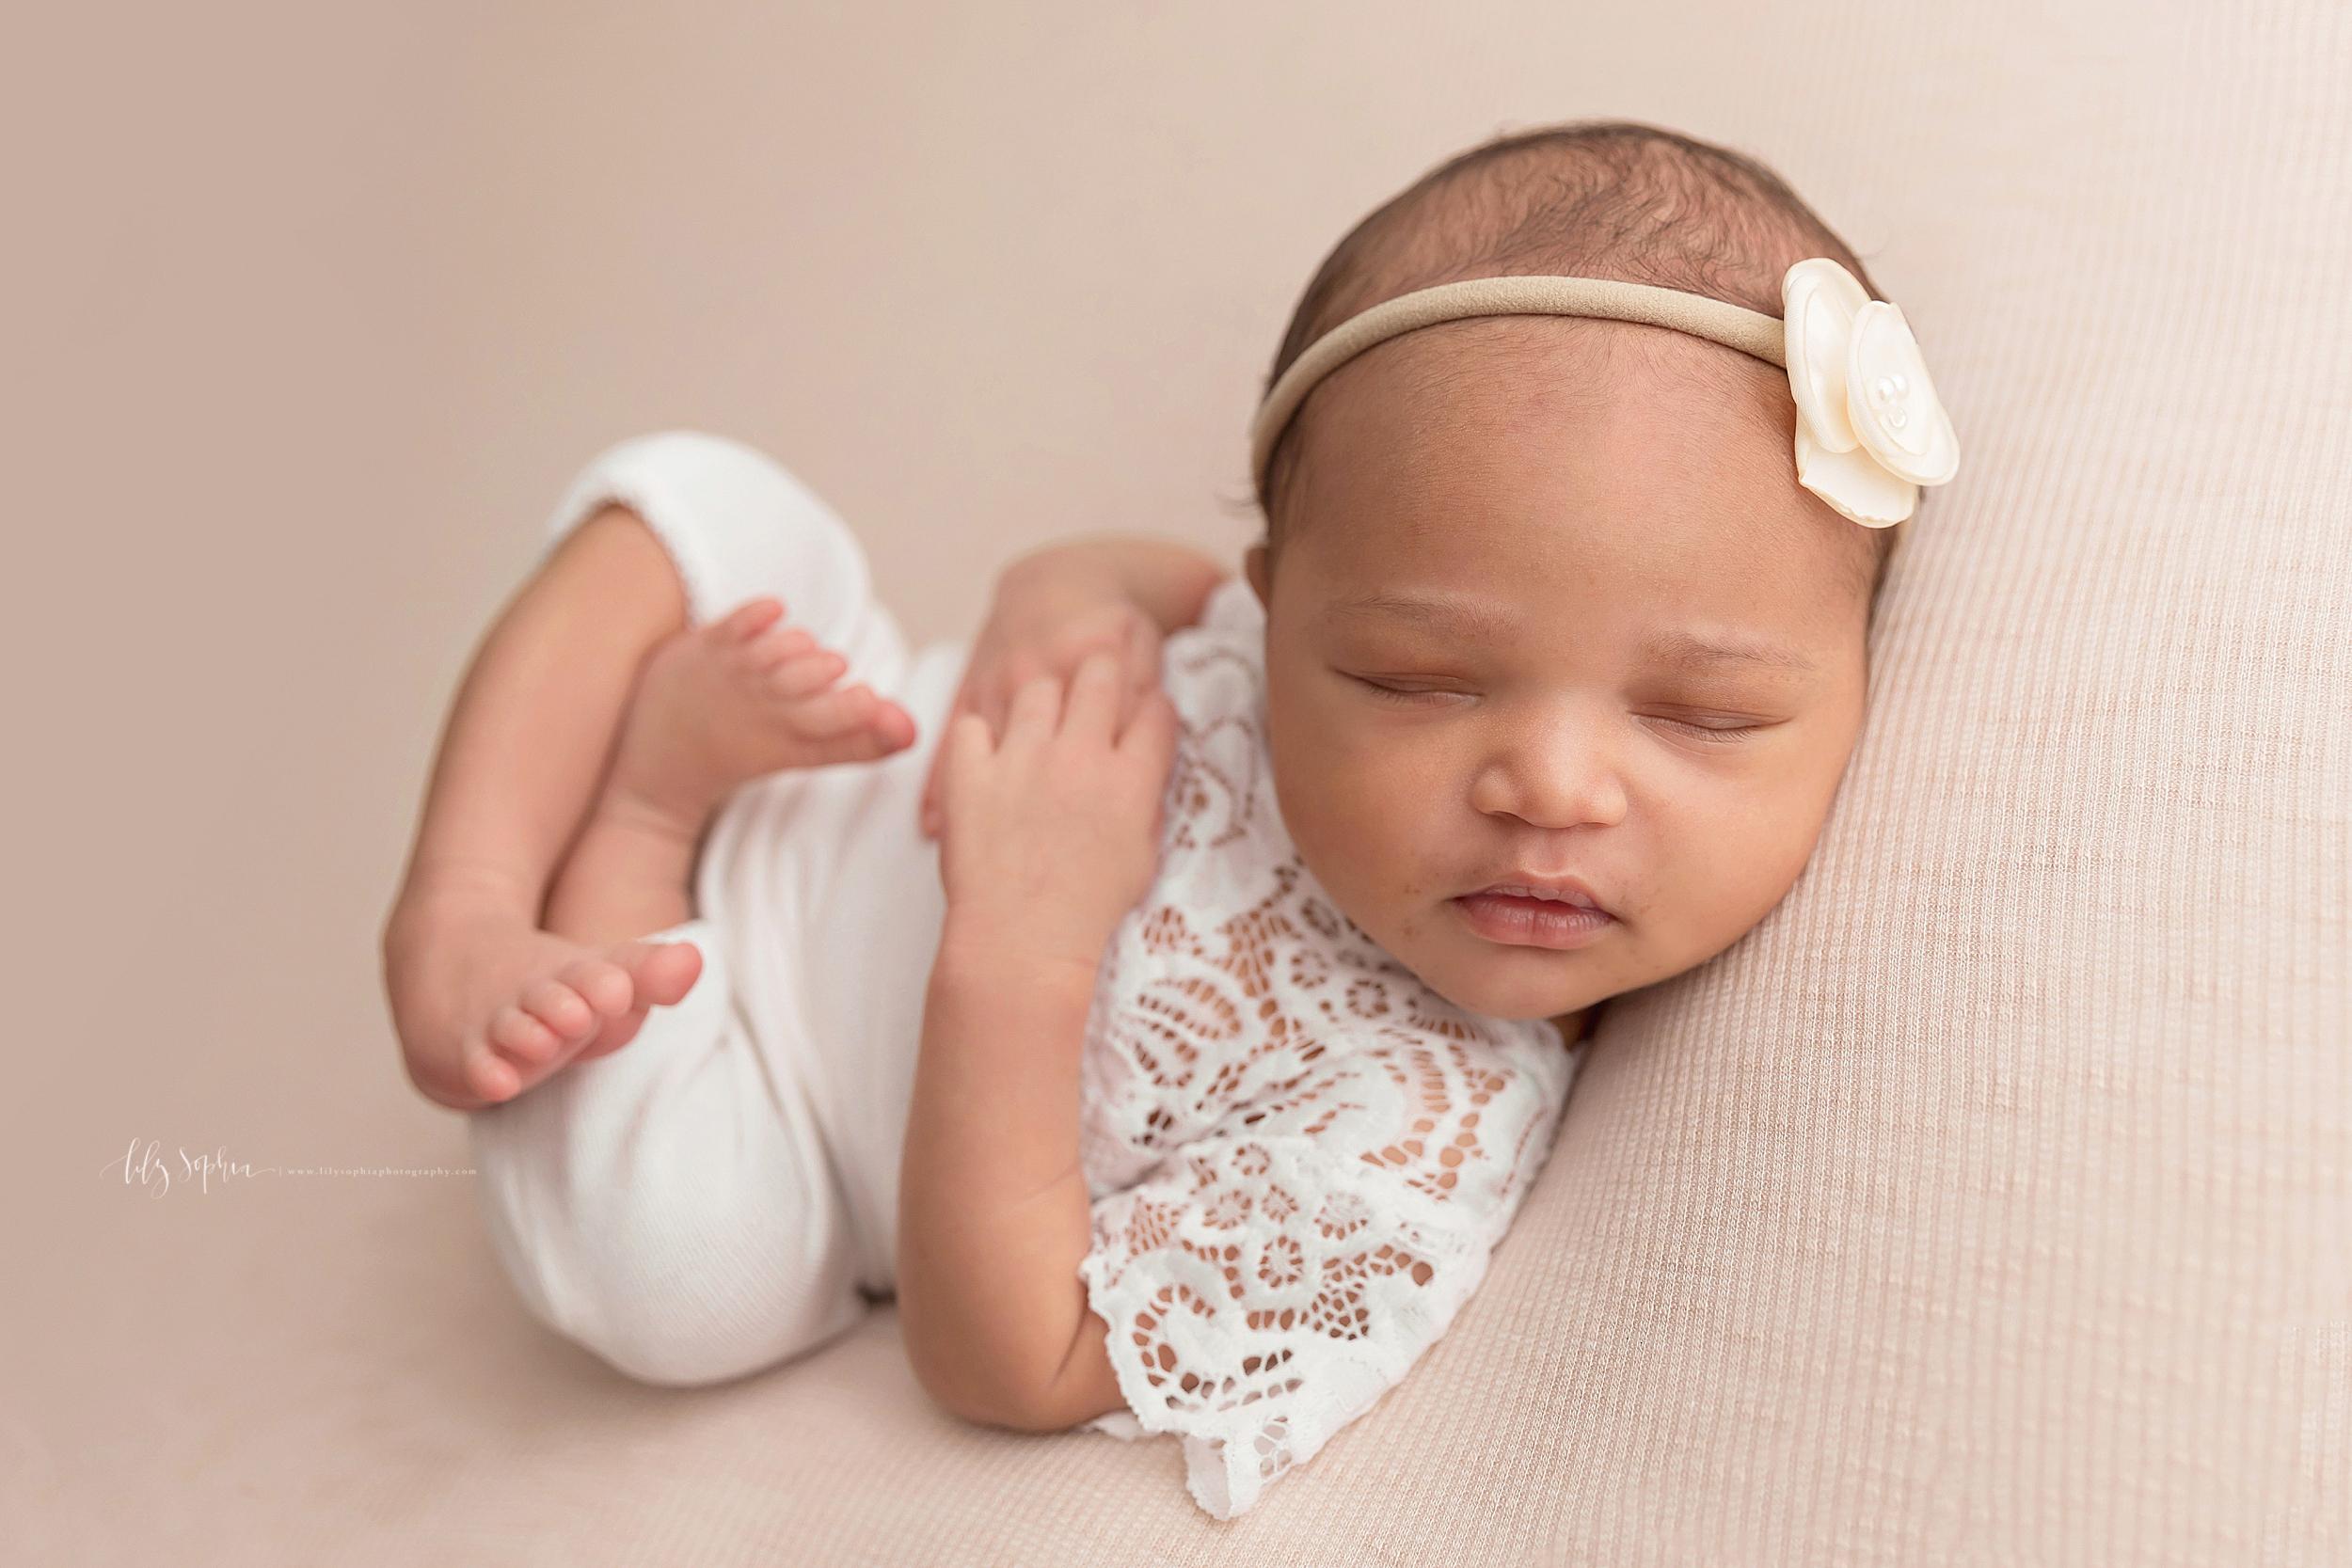 atlanta-midtown-brookhaven-decatur-lily-sophia-photography-photographer-portraits-grant-park-family-studio-newborn-baby-girl-big-brothers_0139.jpg